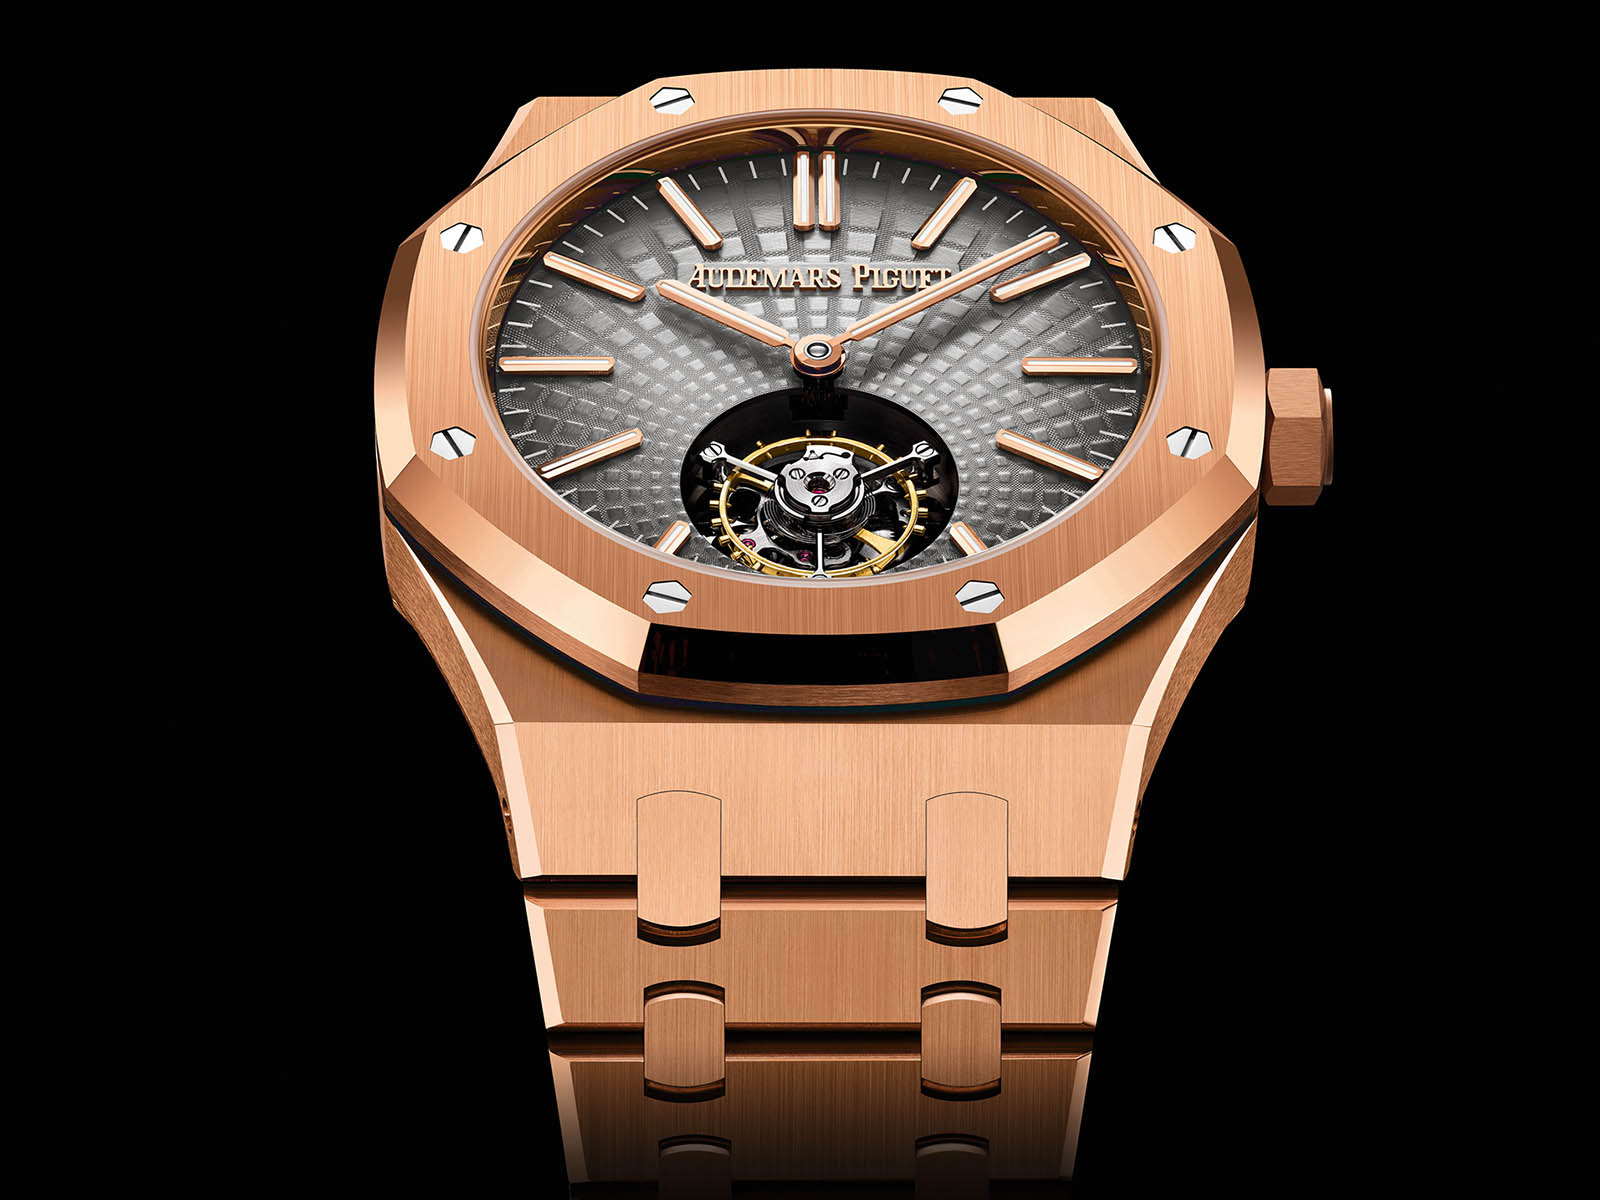 26530or-oo-1220or-01-audemars-piguet-royal-oak-selfwinding-flying-tourbillon-pink-gold-1.jpg